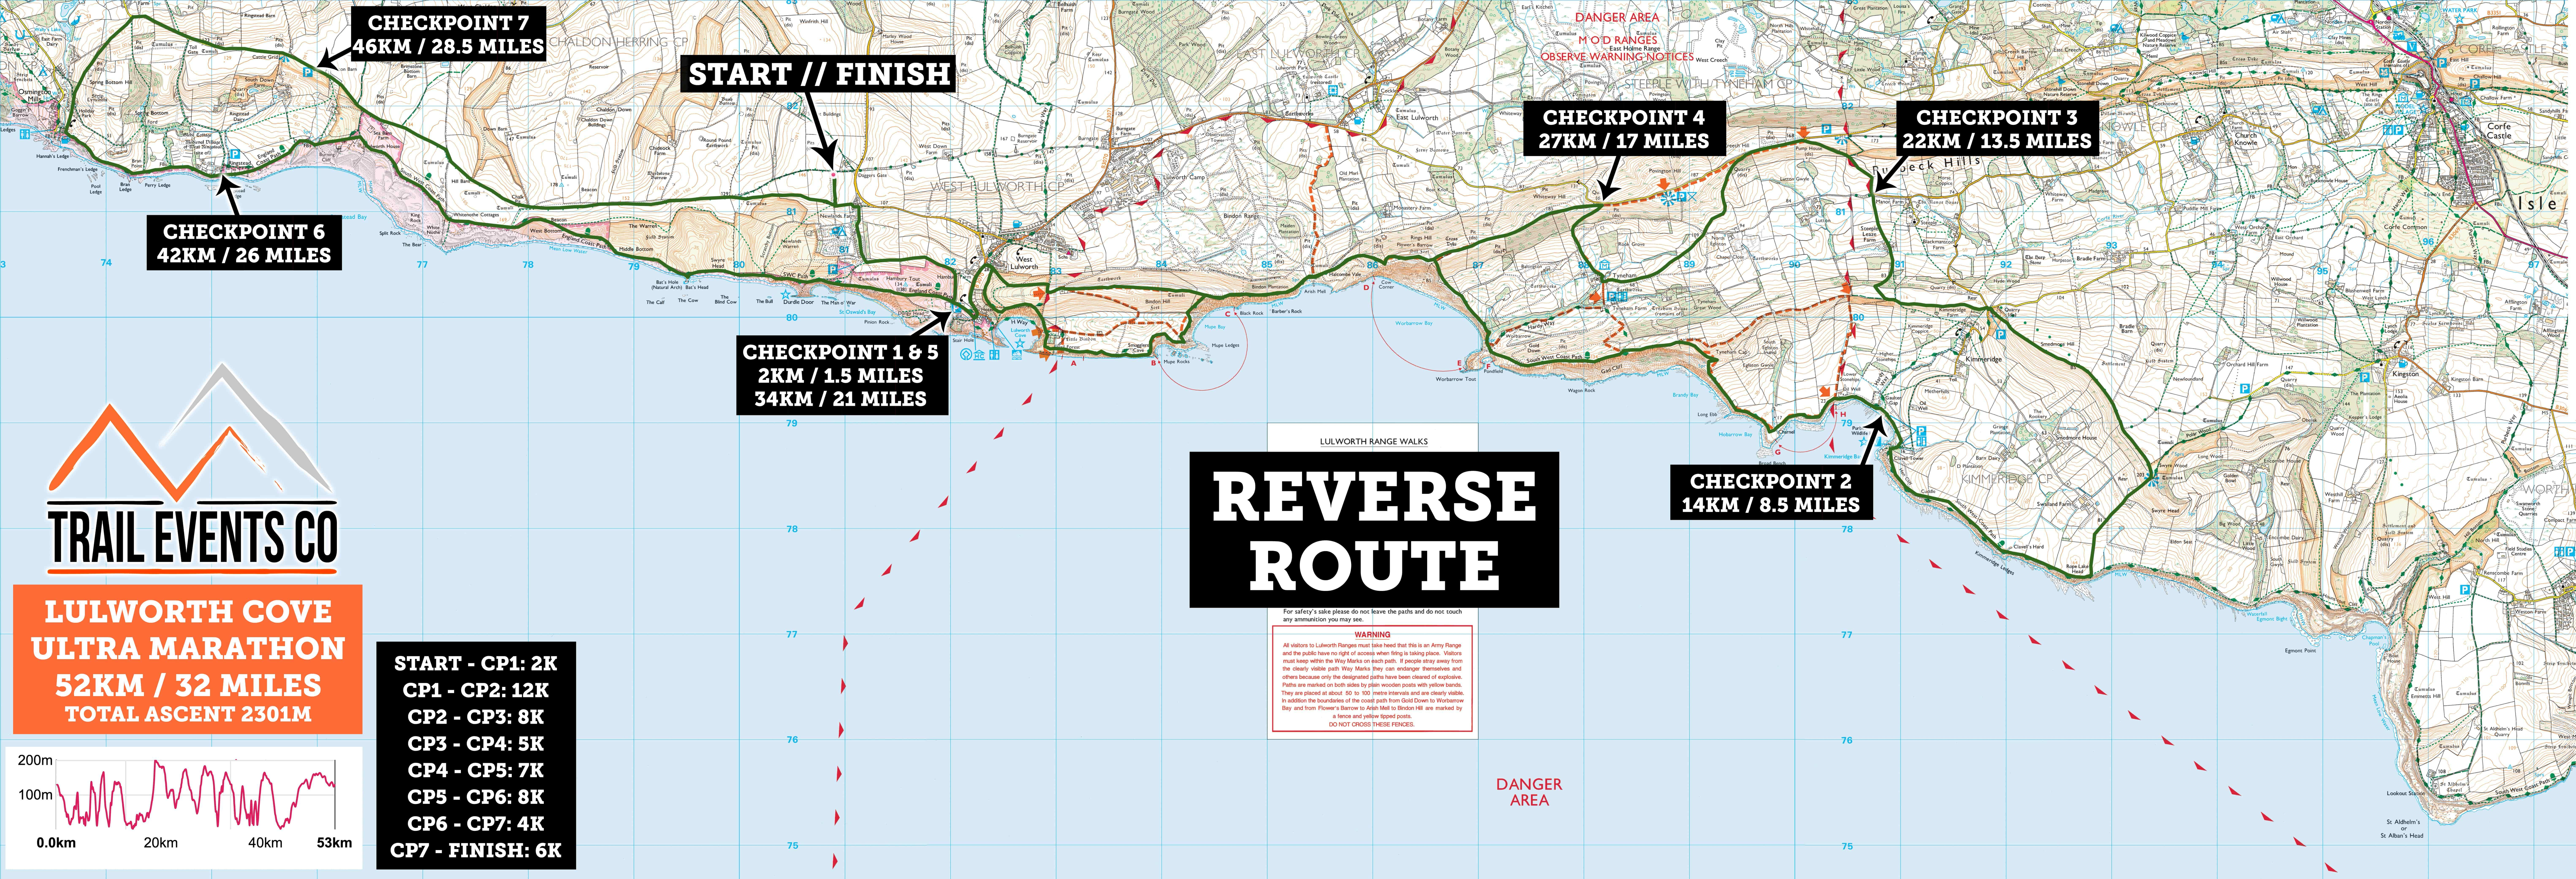 Lulworth Cove Ultra Marathon Reverse